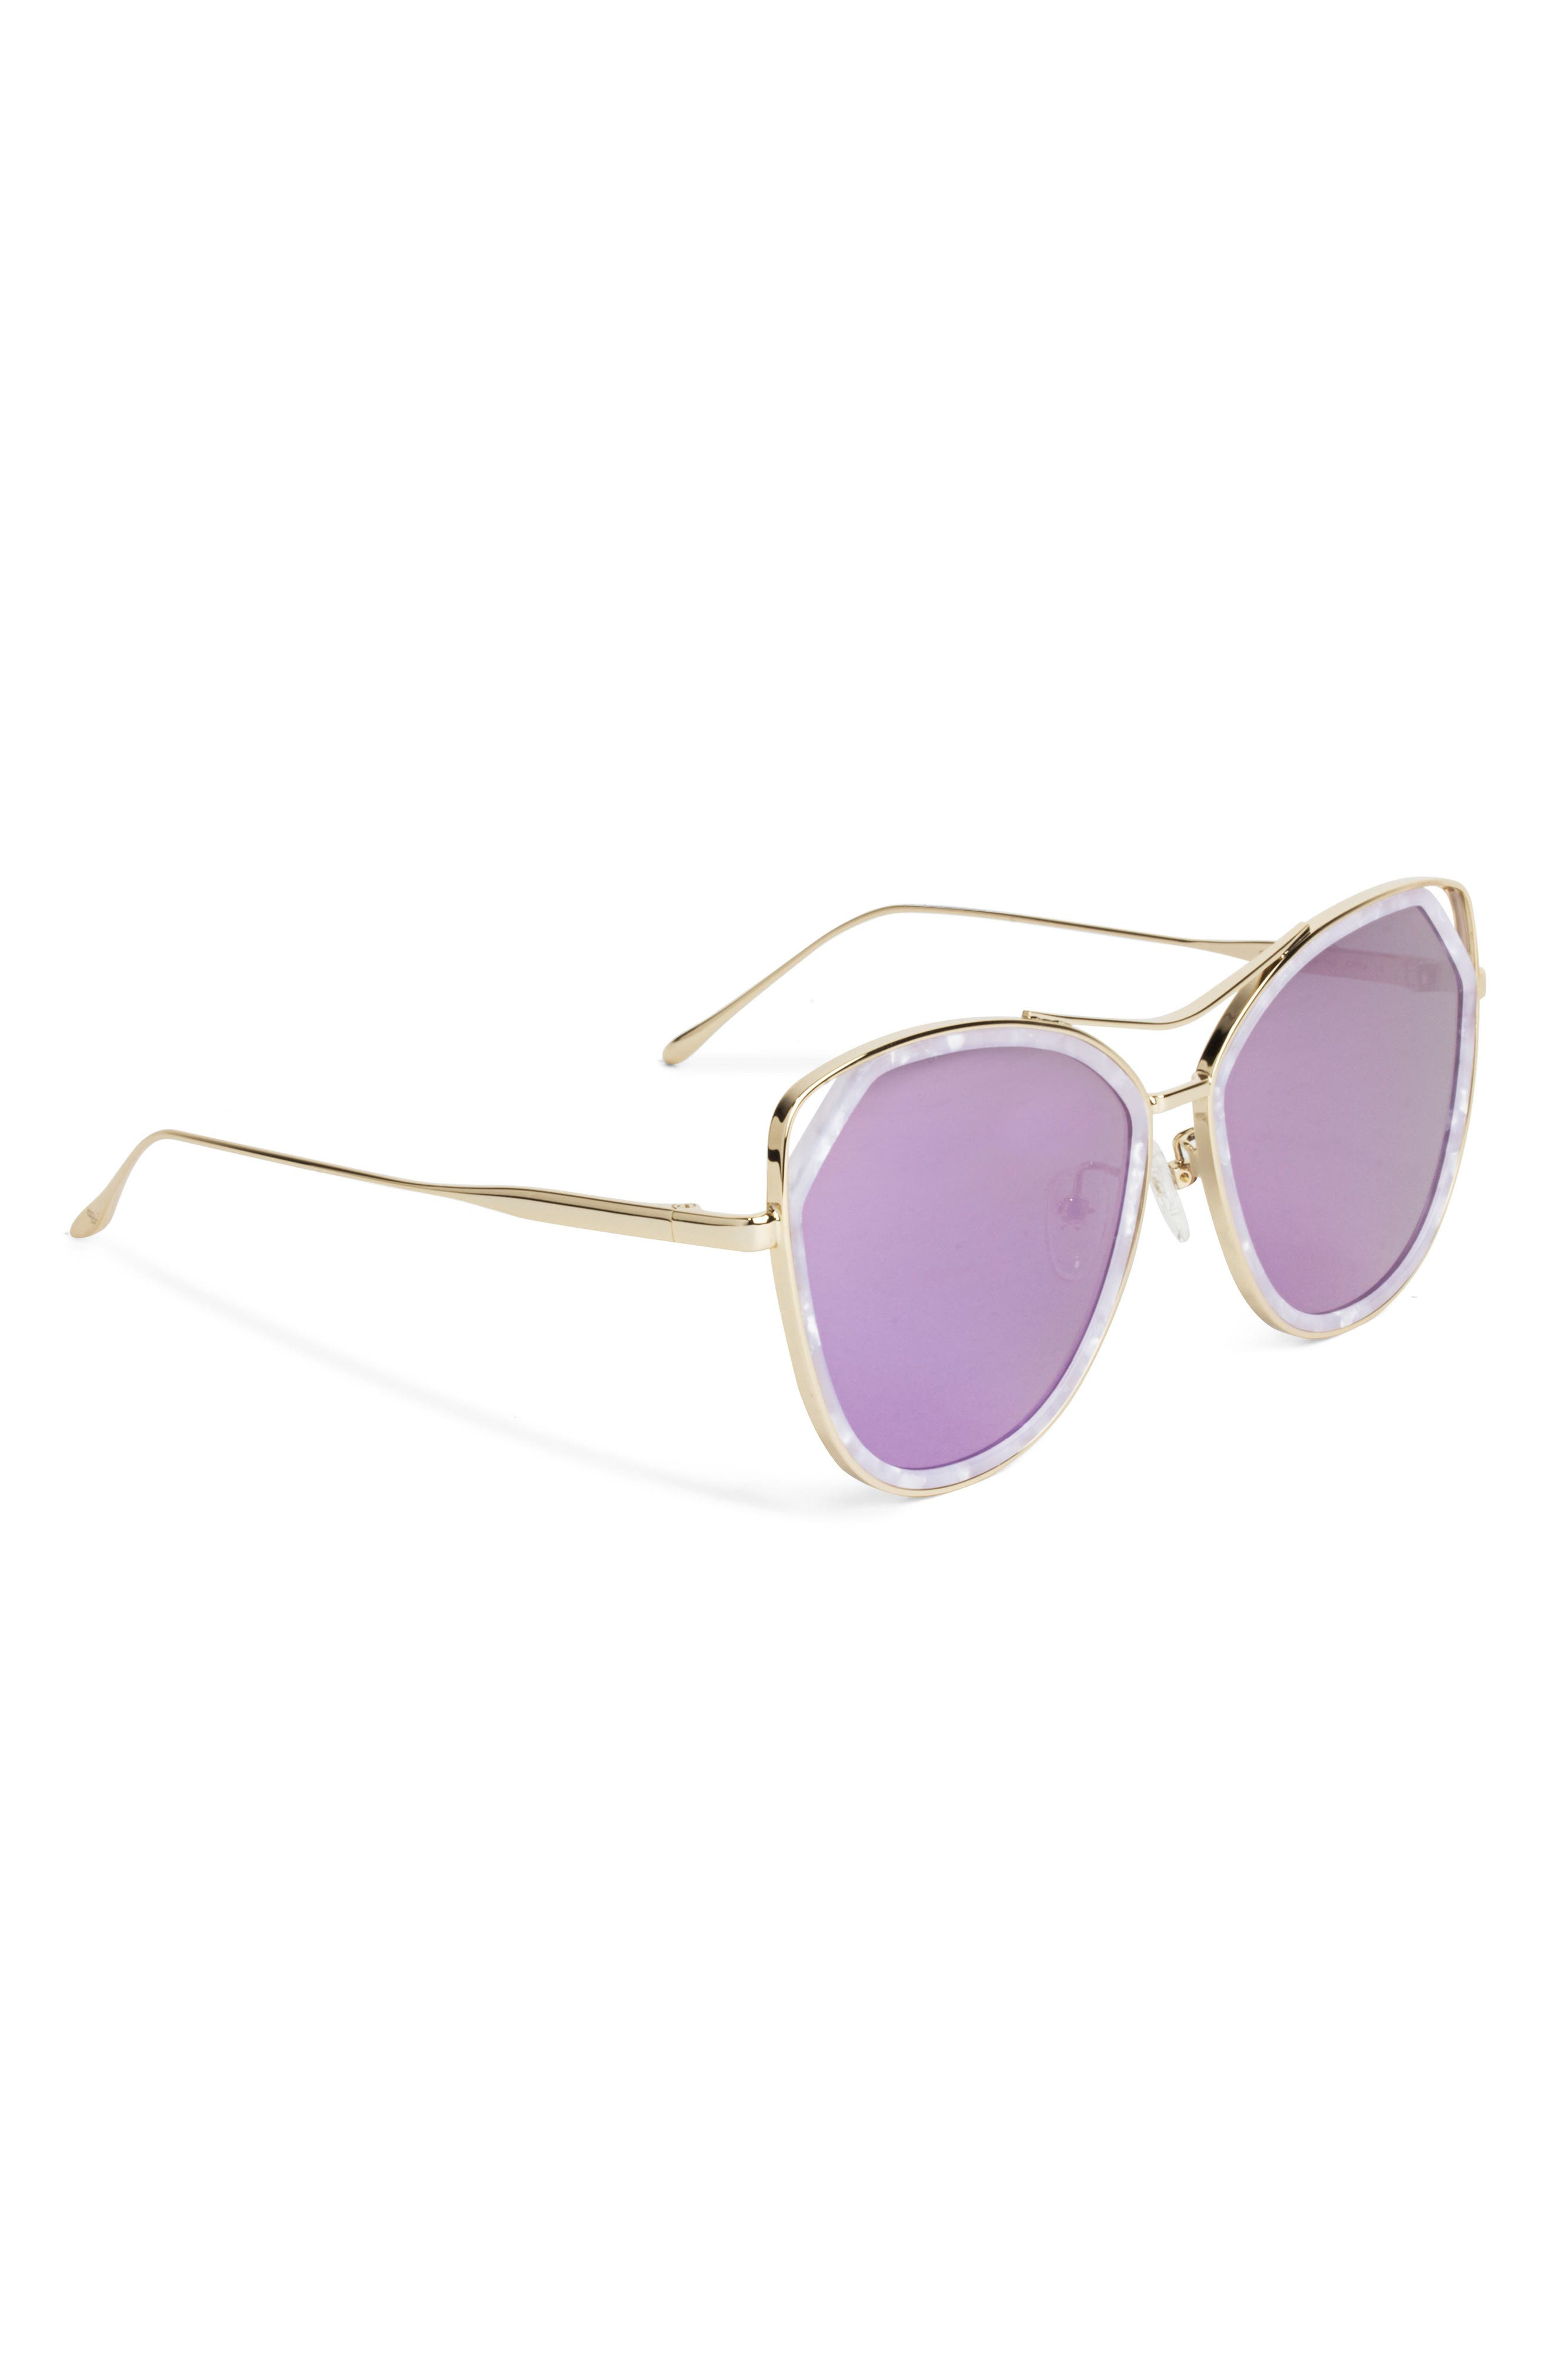 Grand 56mm Polarized Cat Eye Sunglasses,                             Alternate thumbnail 4, color,                             Lavender